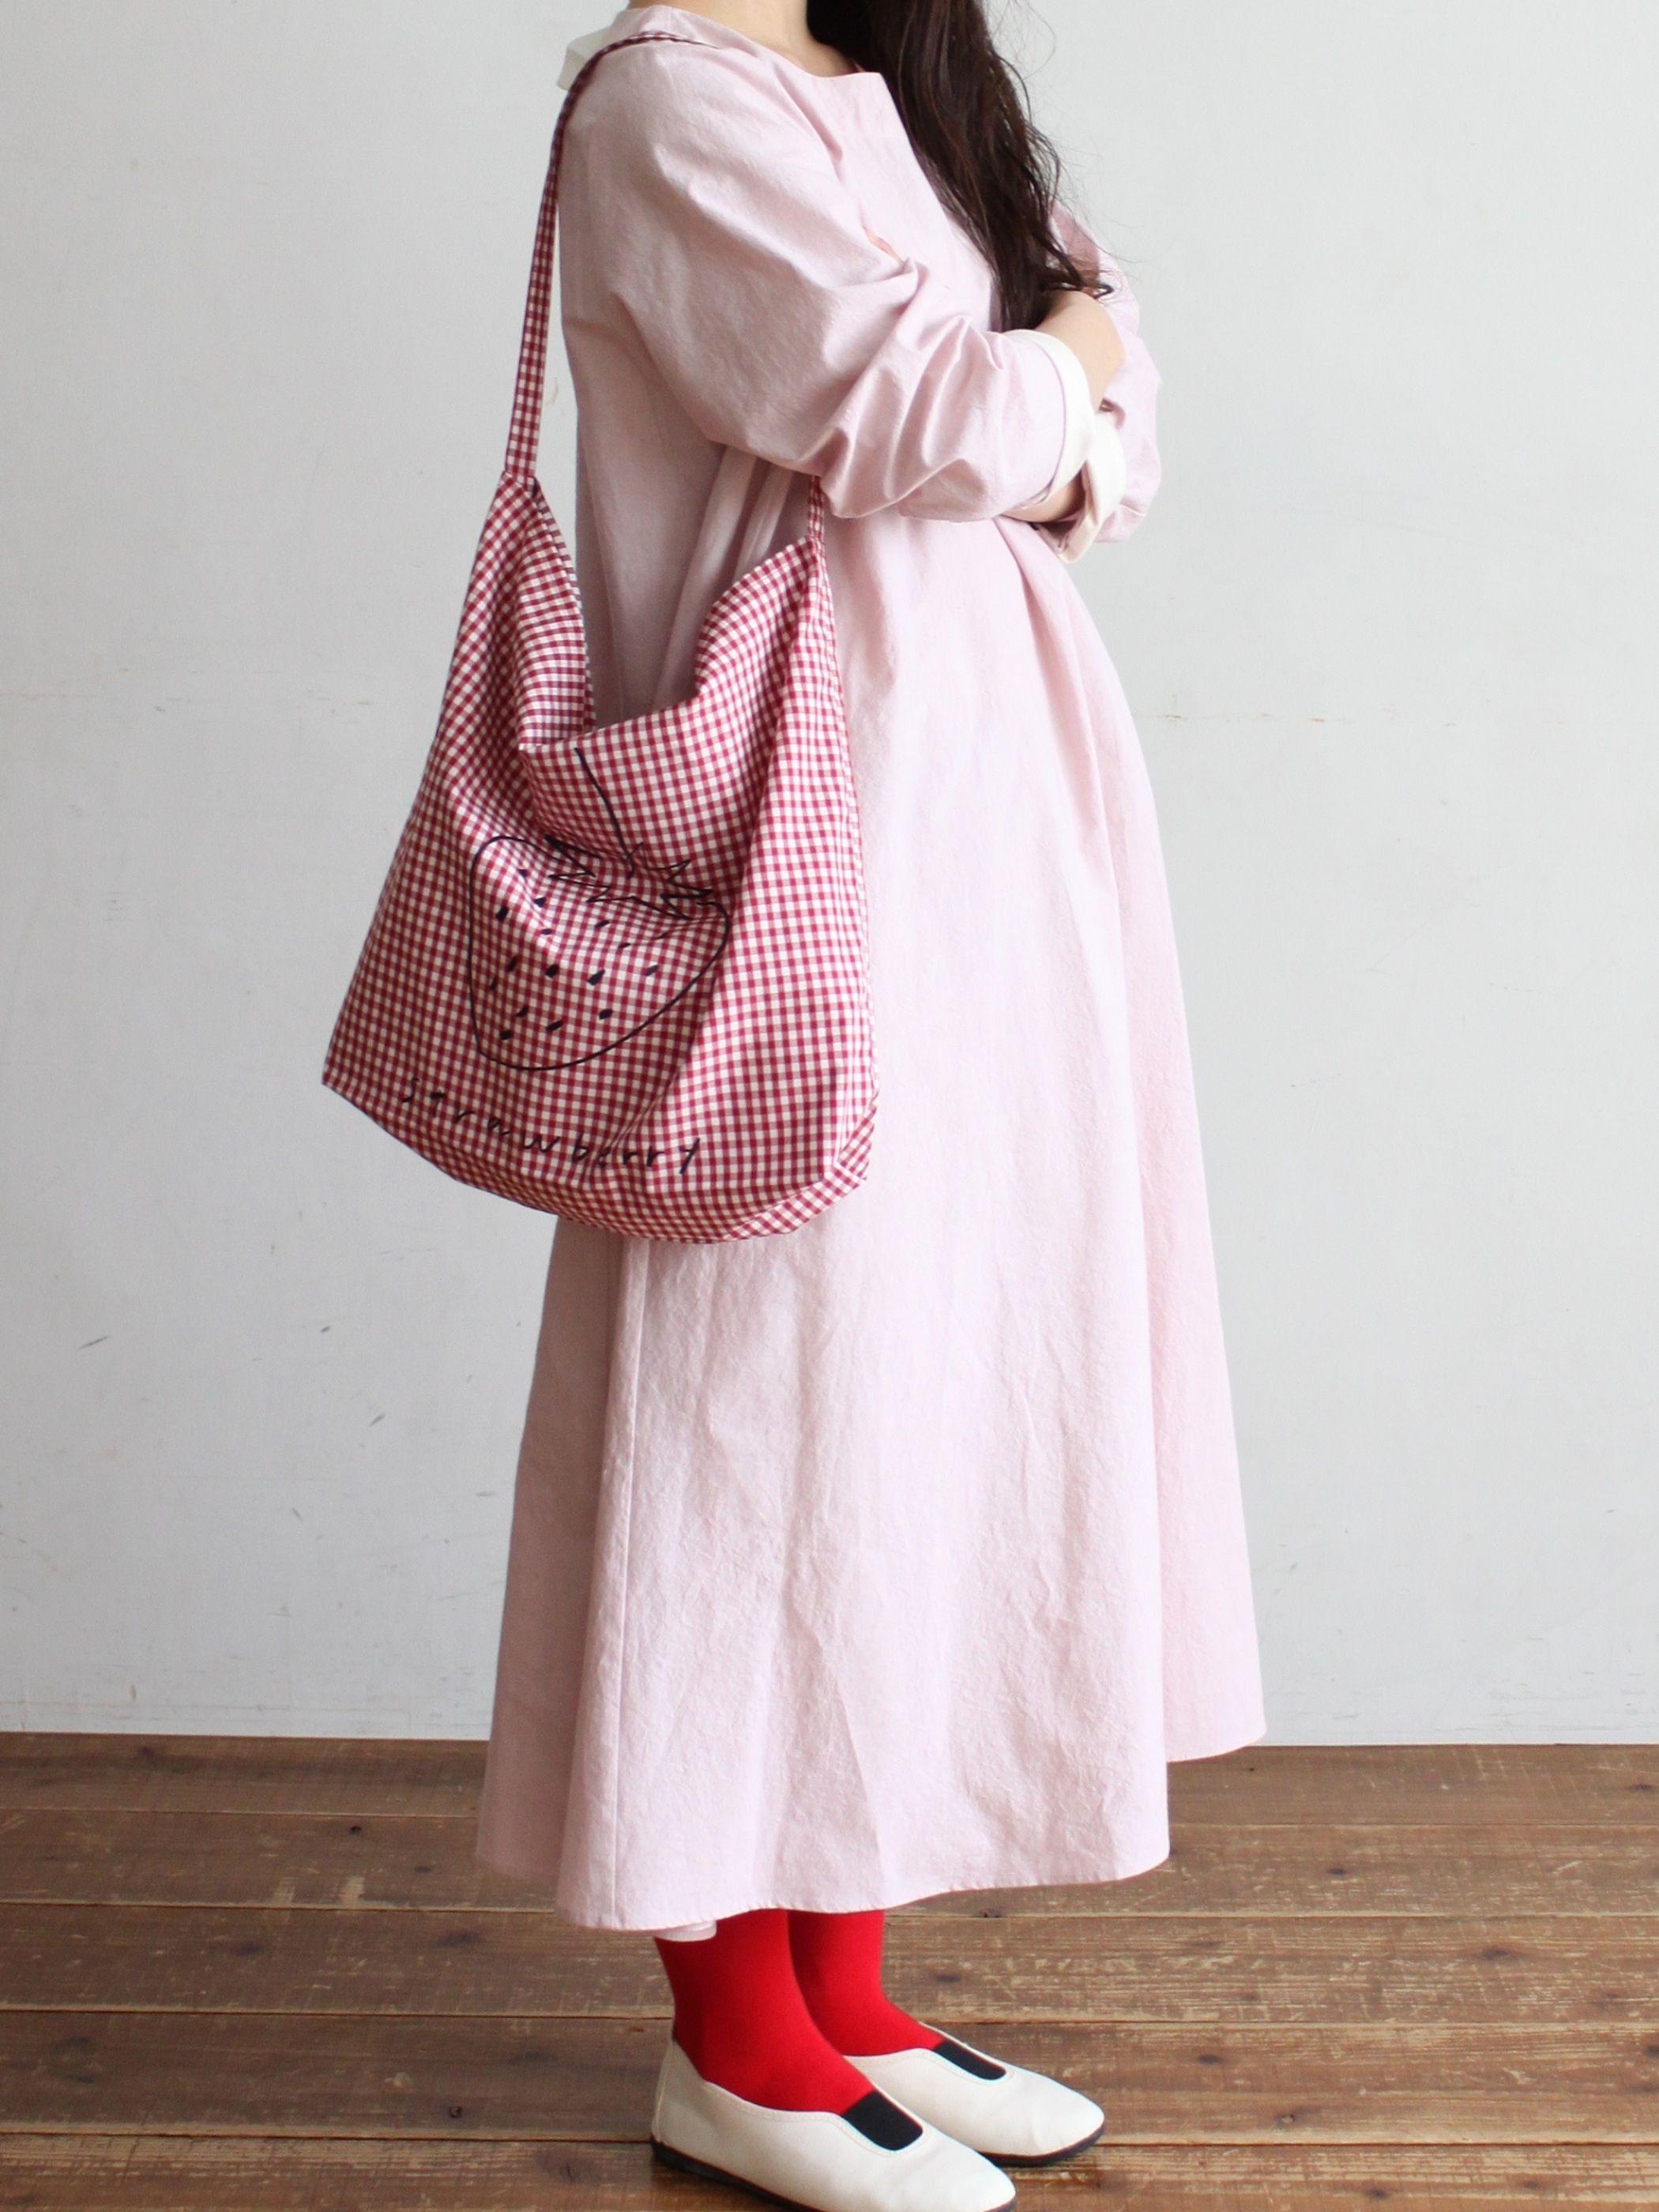 pot and tea バックリボンコットンワンピース potandtea ポットアンドティー casualdress pink gray cottondress backribbon fashion madeinjapan craft h ファッション コットン ワンピース リボンバック